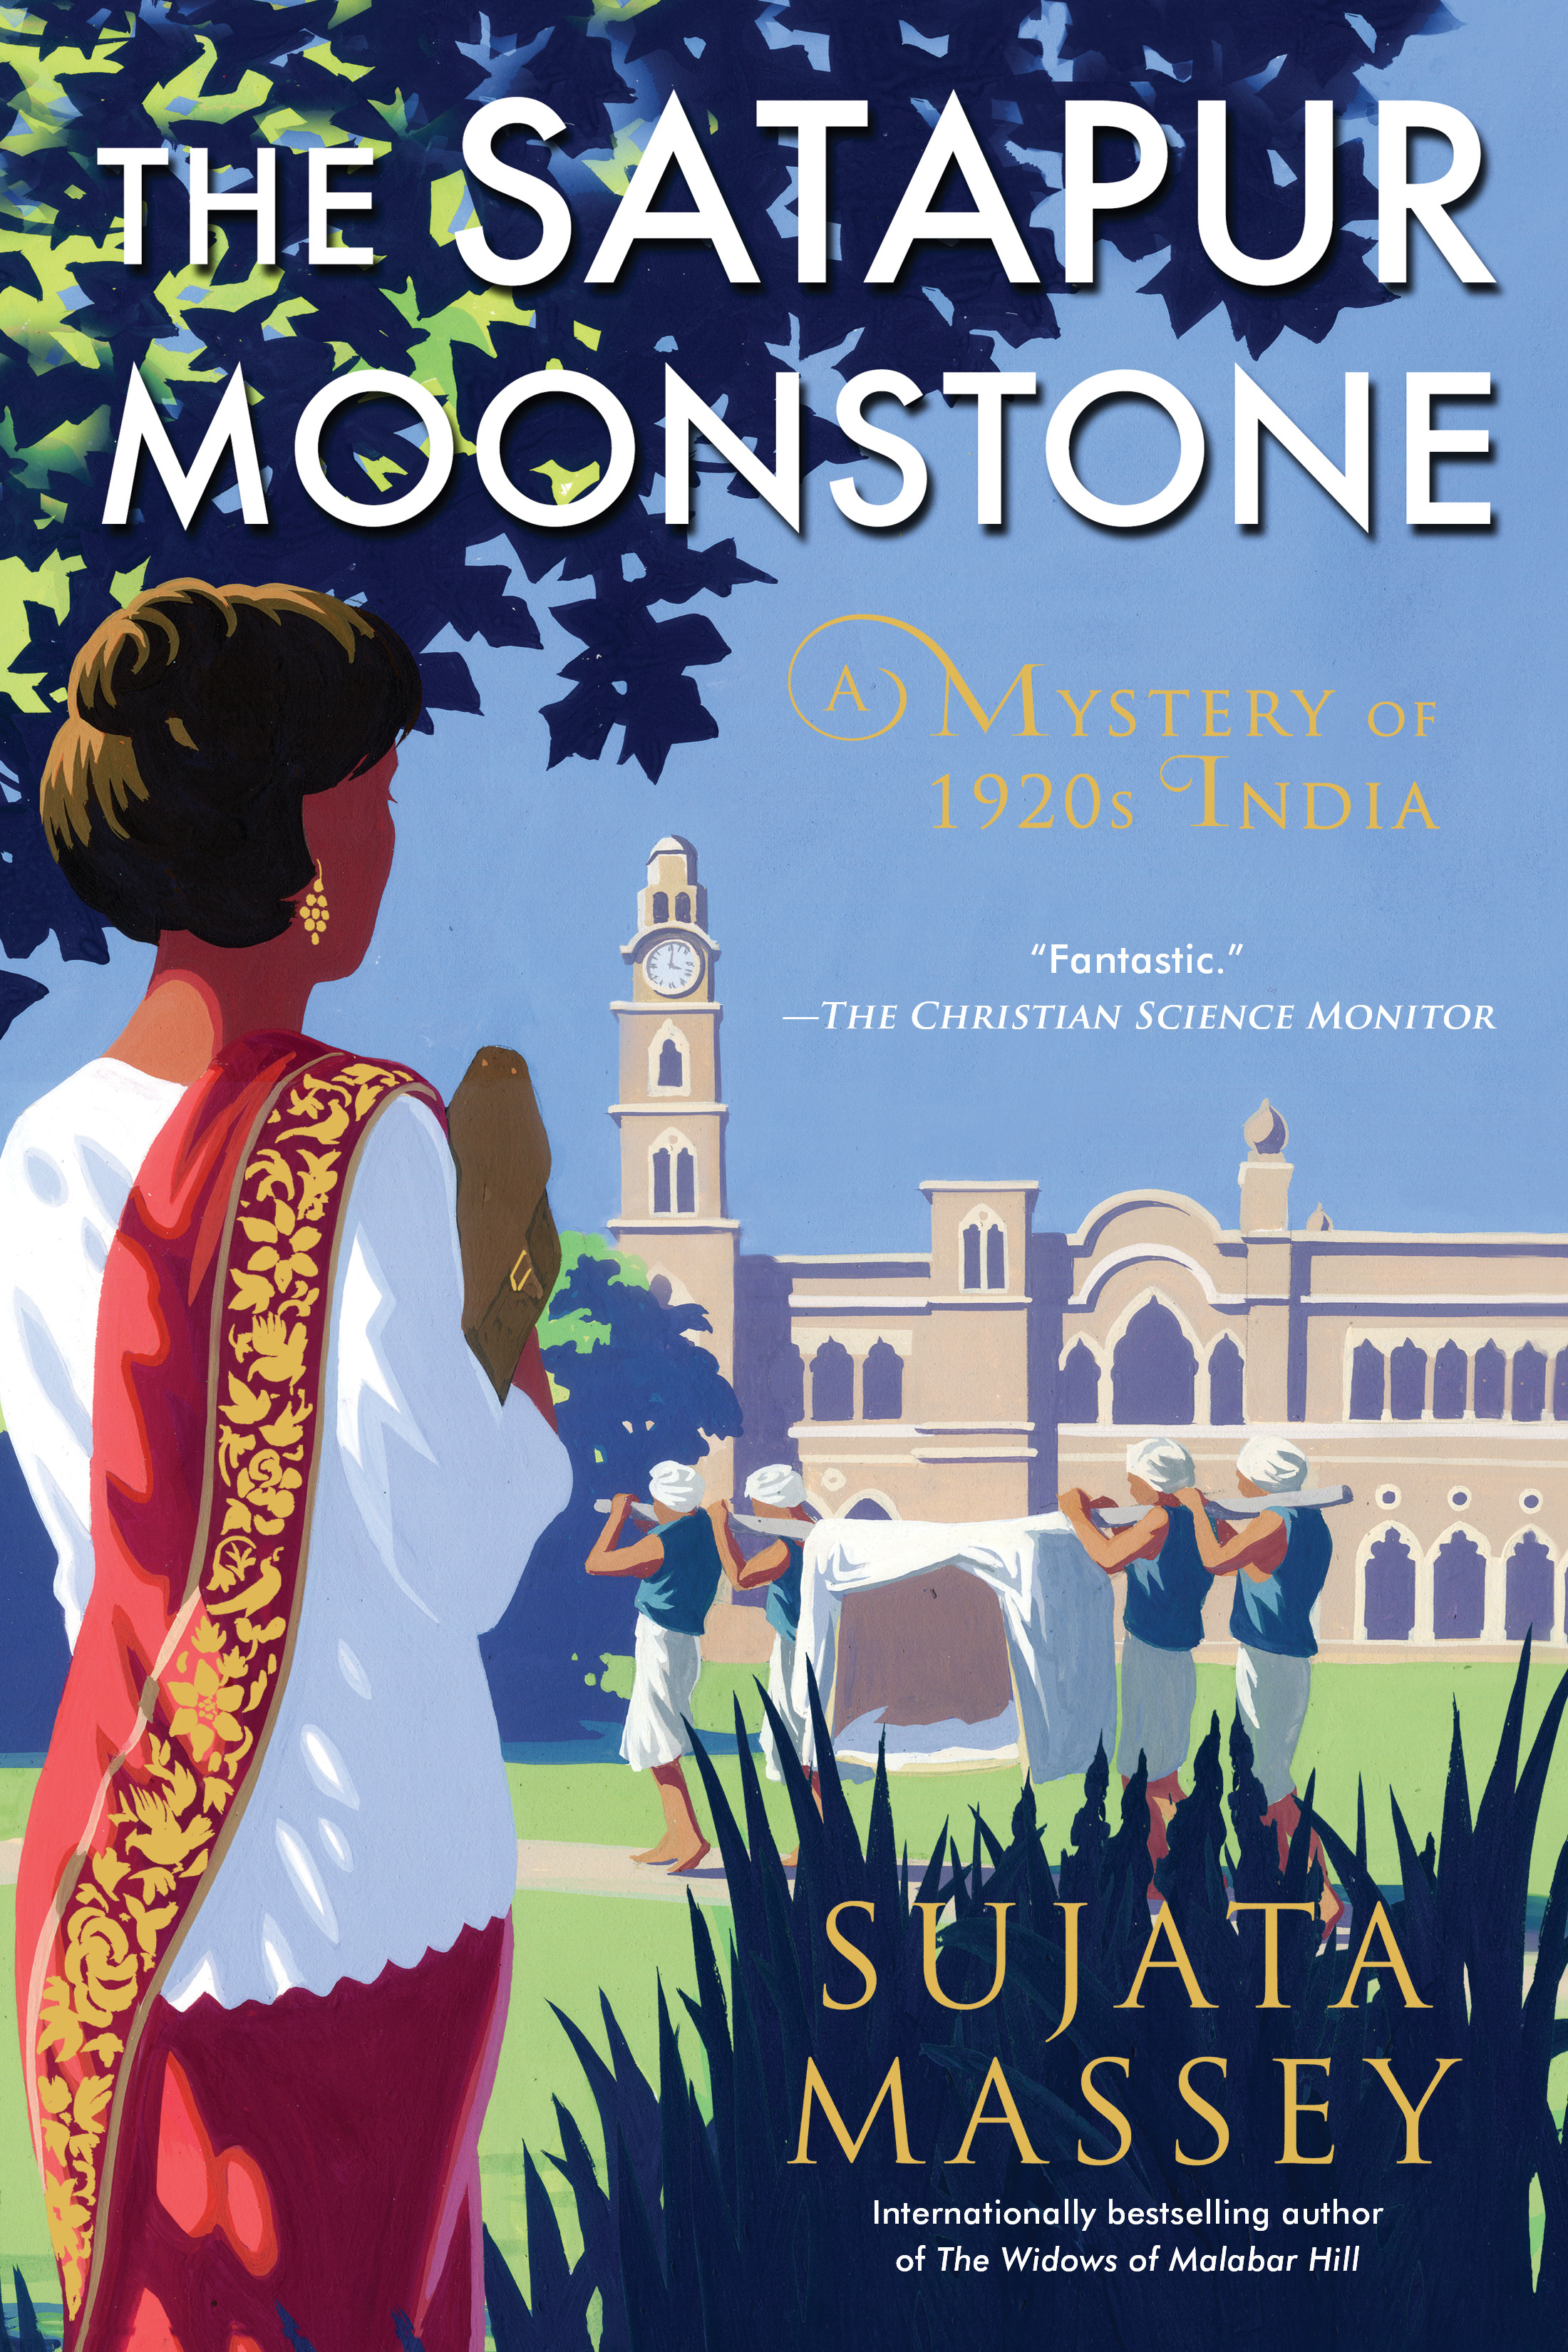 The Satapur Moonstone by Sujata Massey (Perveen Mistry Book 2)